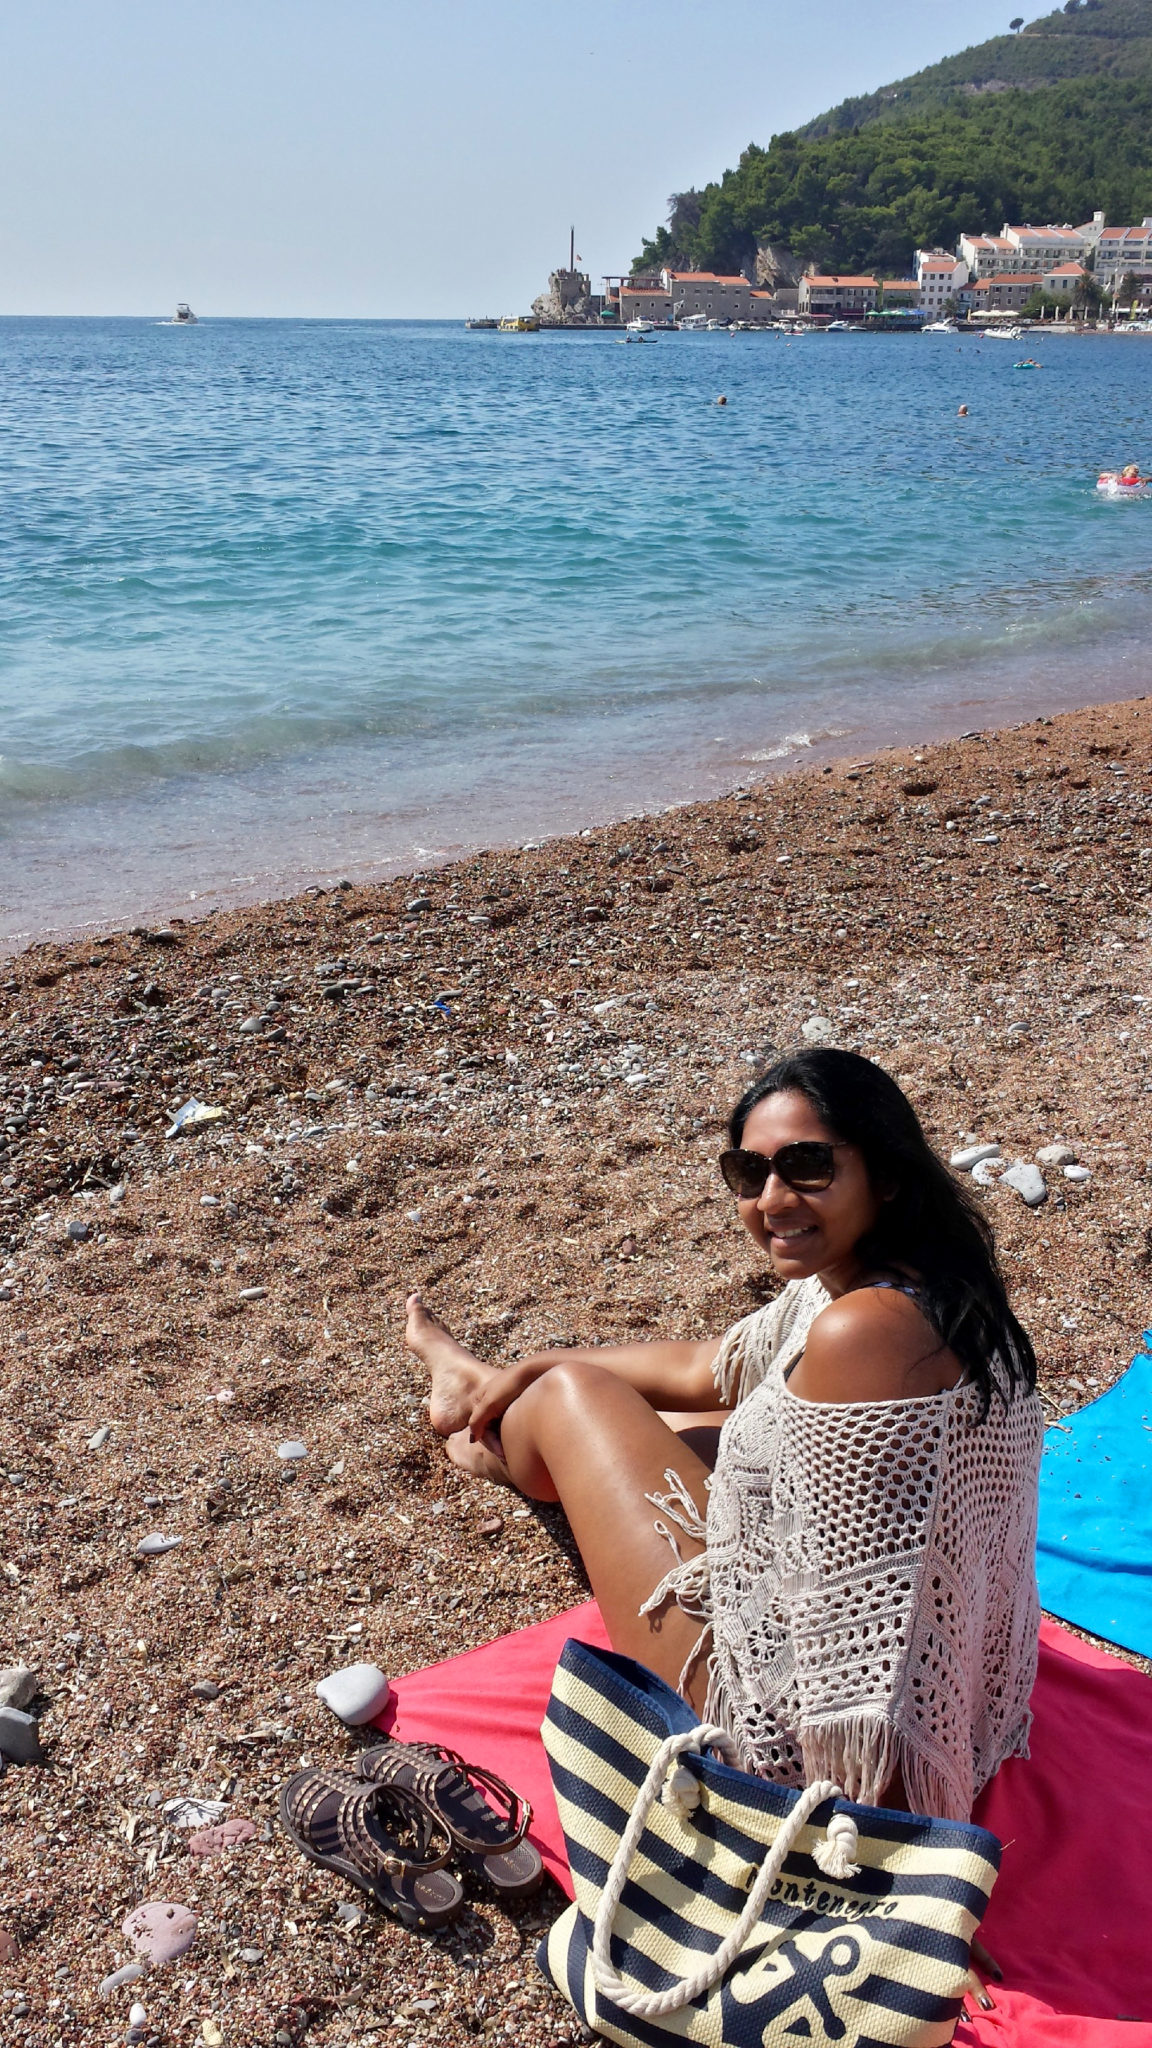 Hema_Montenegro_Adriatic_Coast_Petrovac_Beach_plage_blog_voyage_travel_6